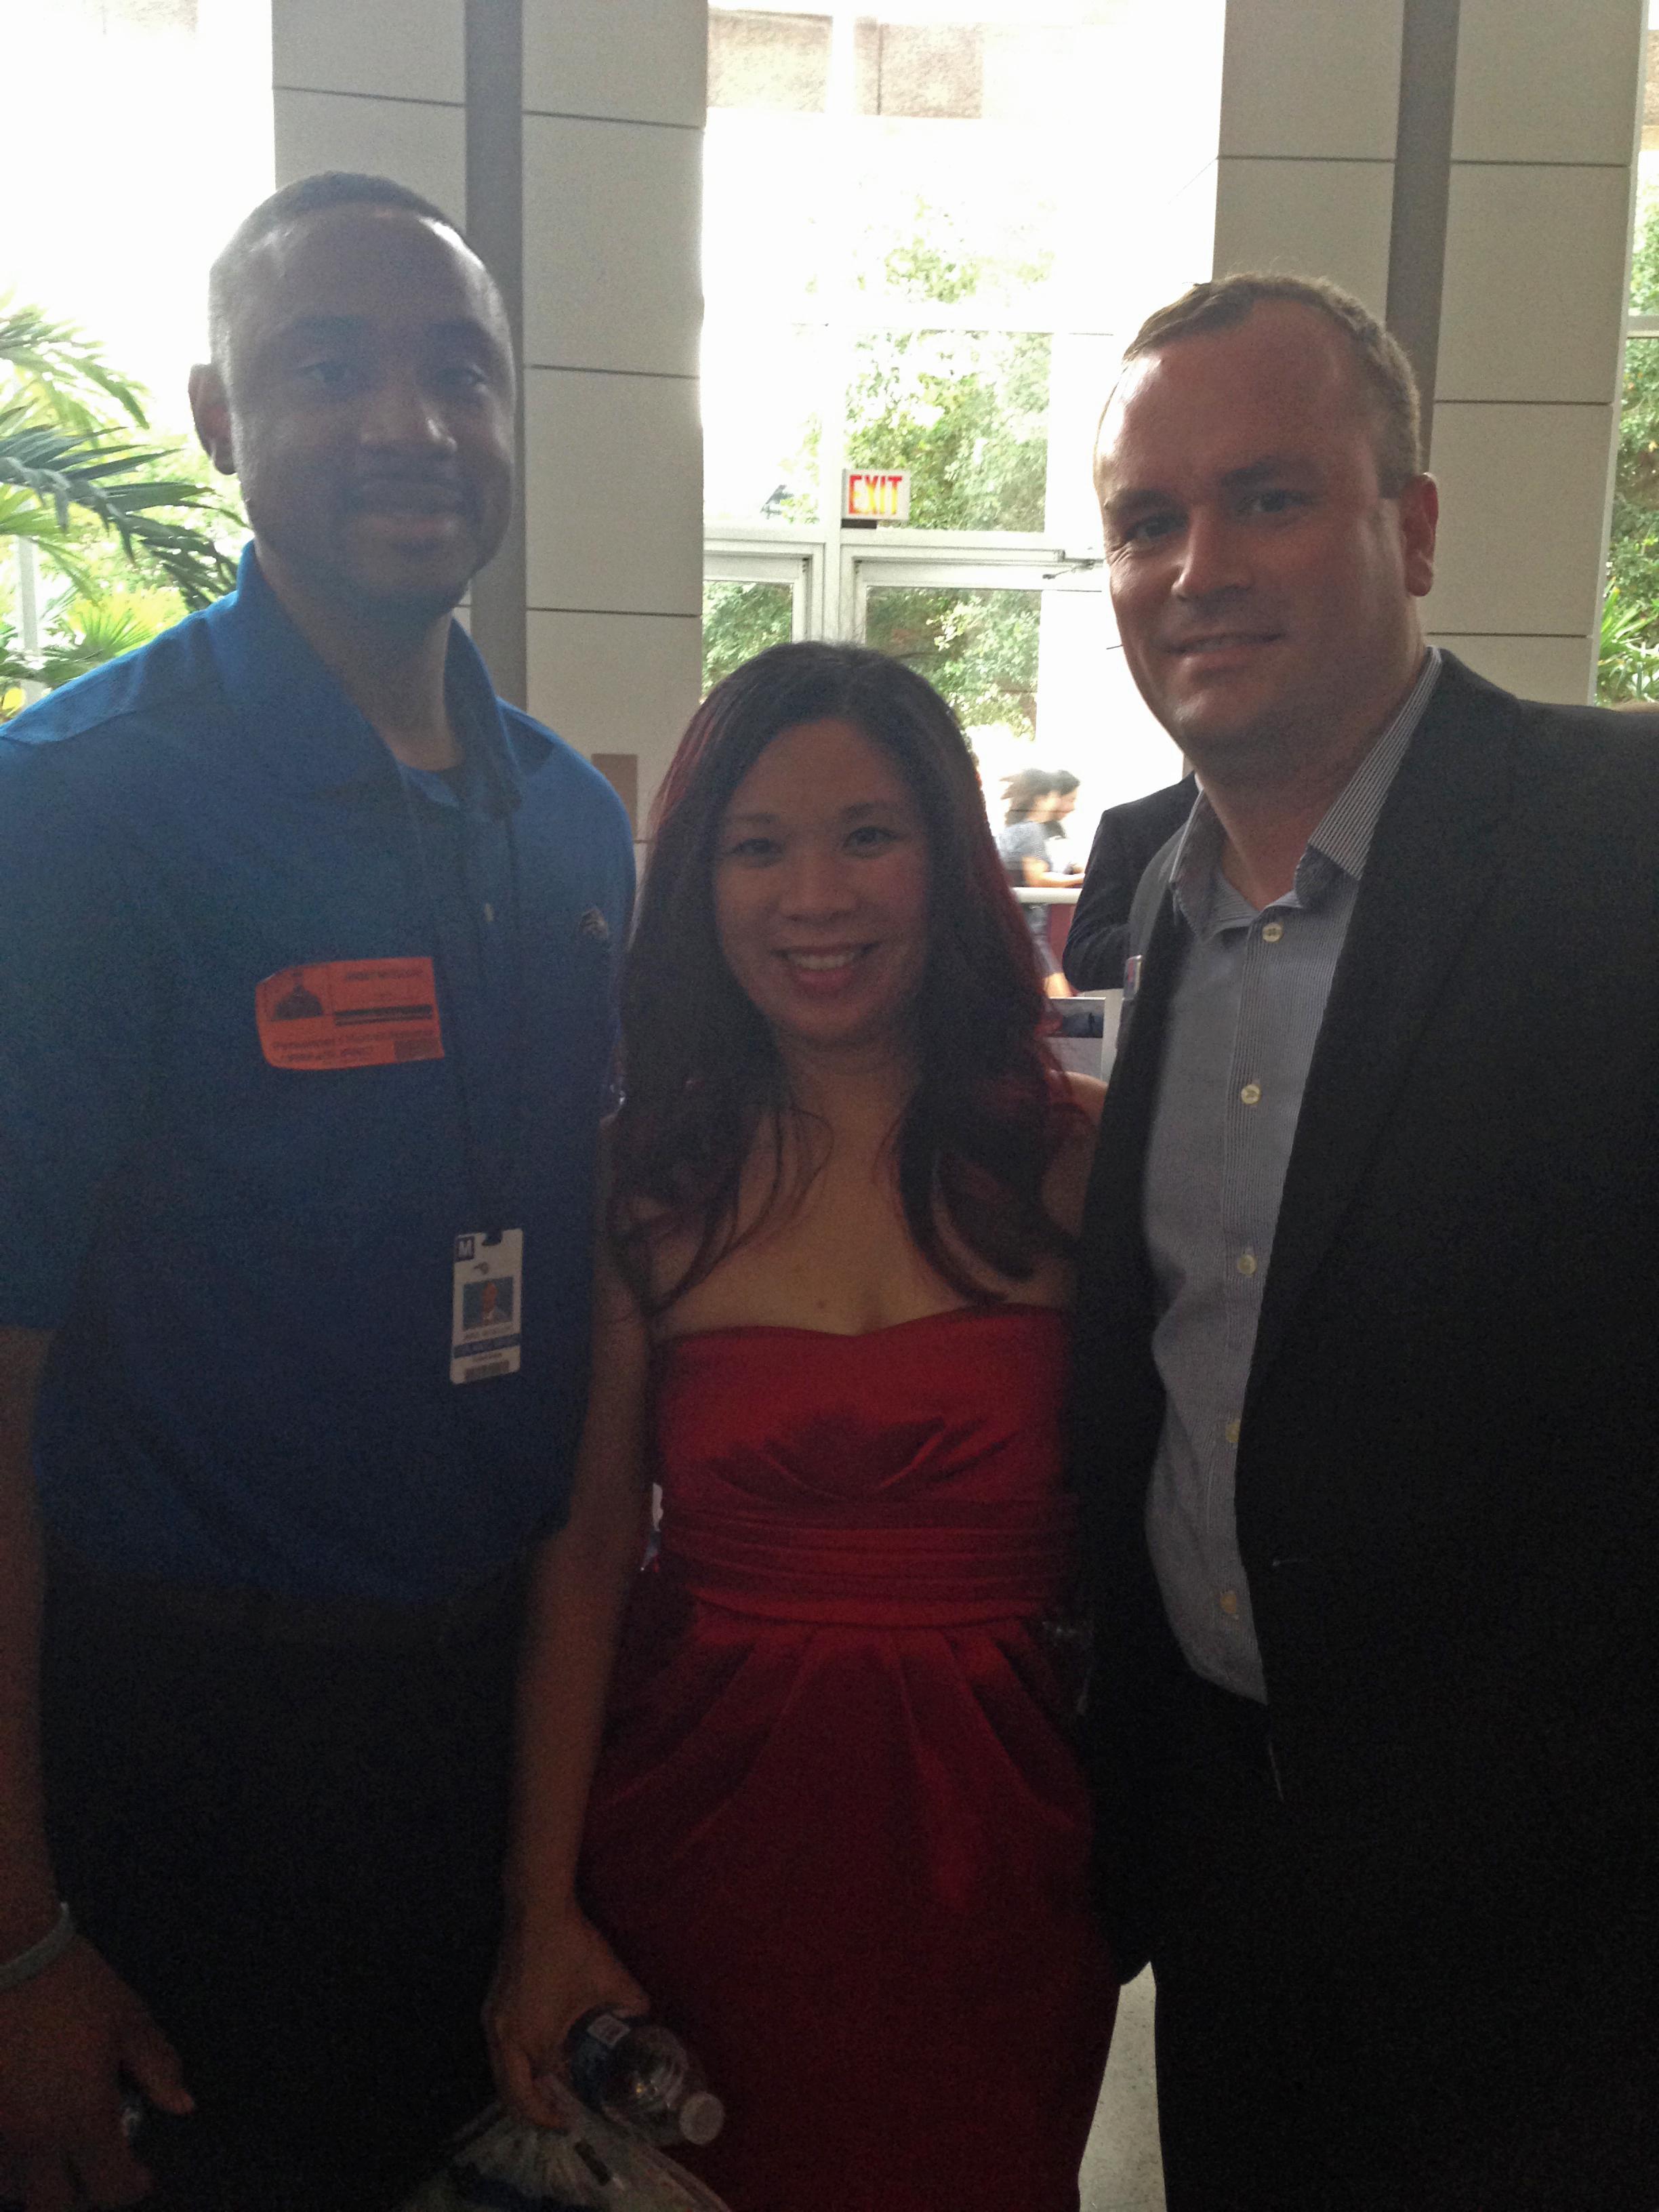 Asian American Chamber of Commerce meeting at Orlando City Hall | May 1, 2014